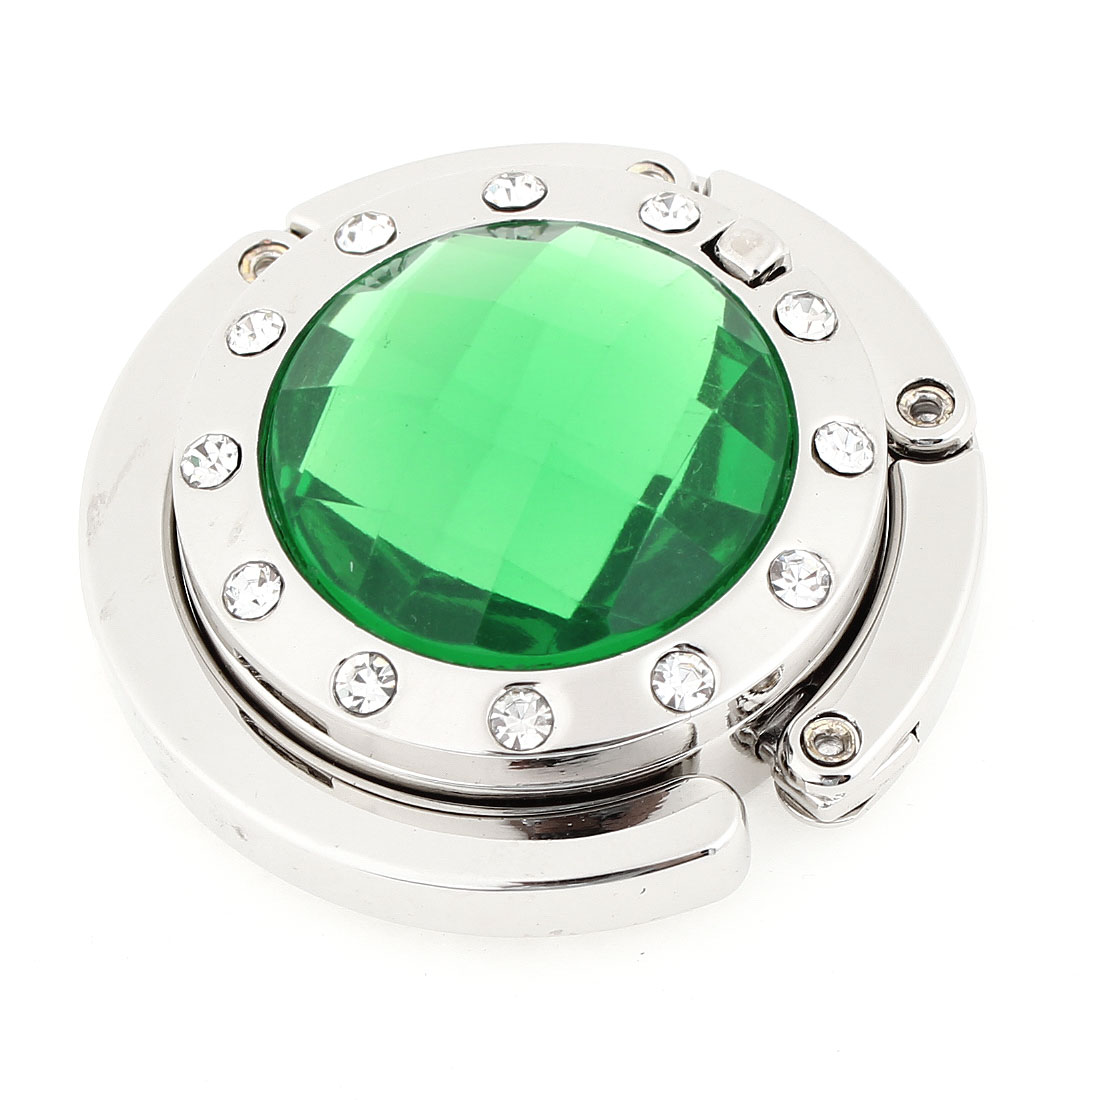 Ladies Green Rhinestone Detailing Silver Tone Hook Handbag Hanger w Mirror